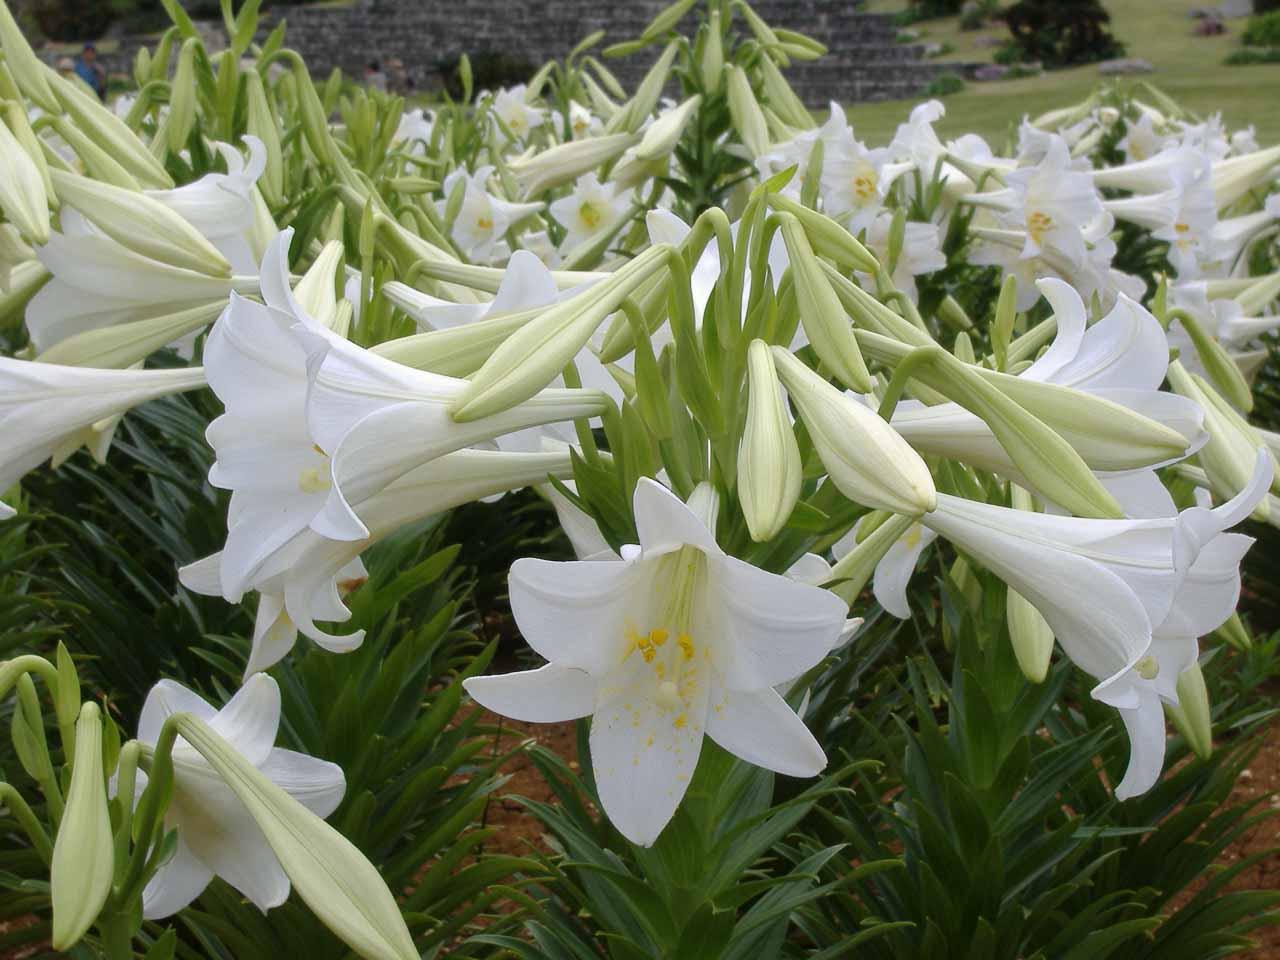 blog花リリーフィールド公園ユリ14080422.jpg